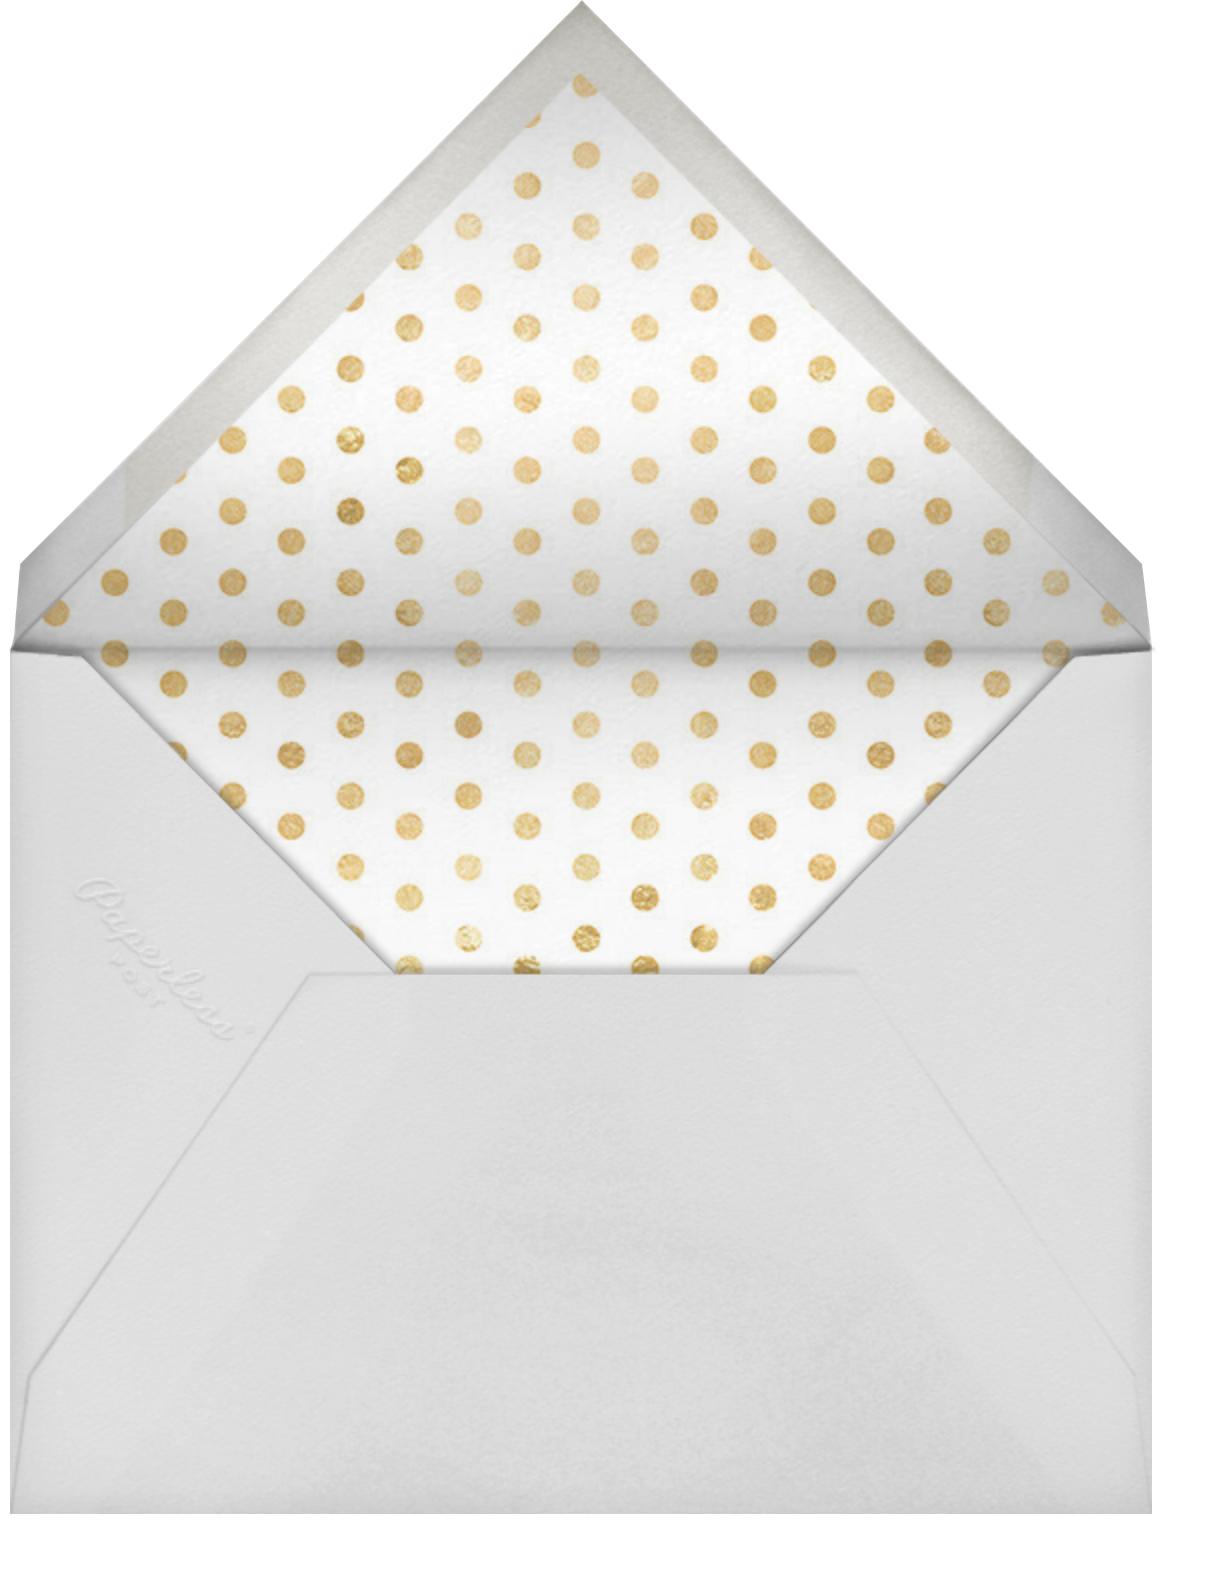 Princess Cake - Rifle Paper Co. - Engagement party - envelope back